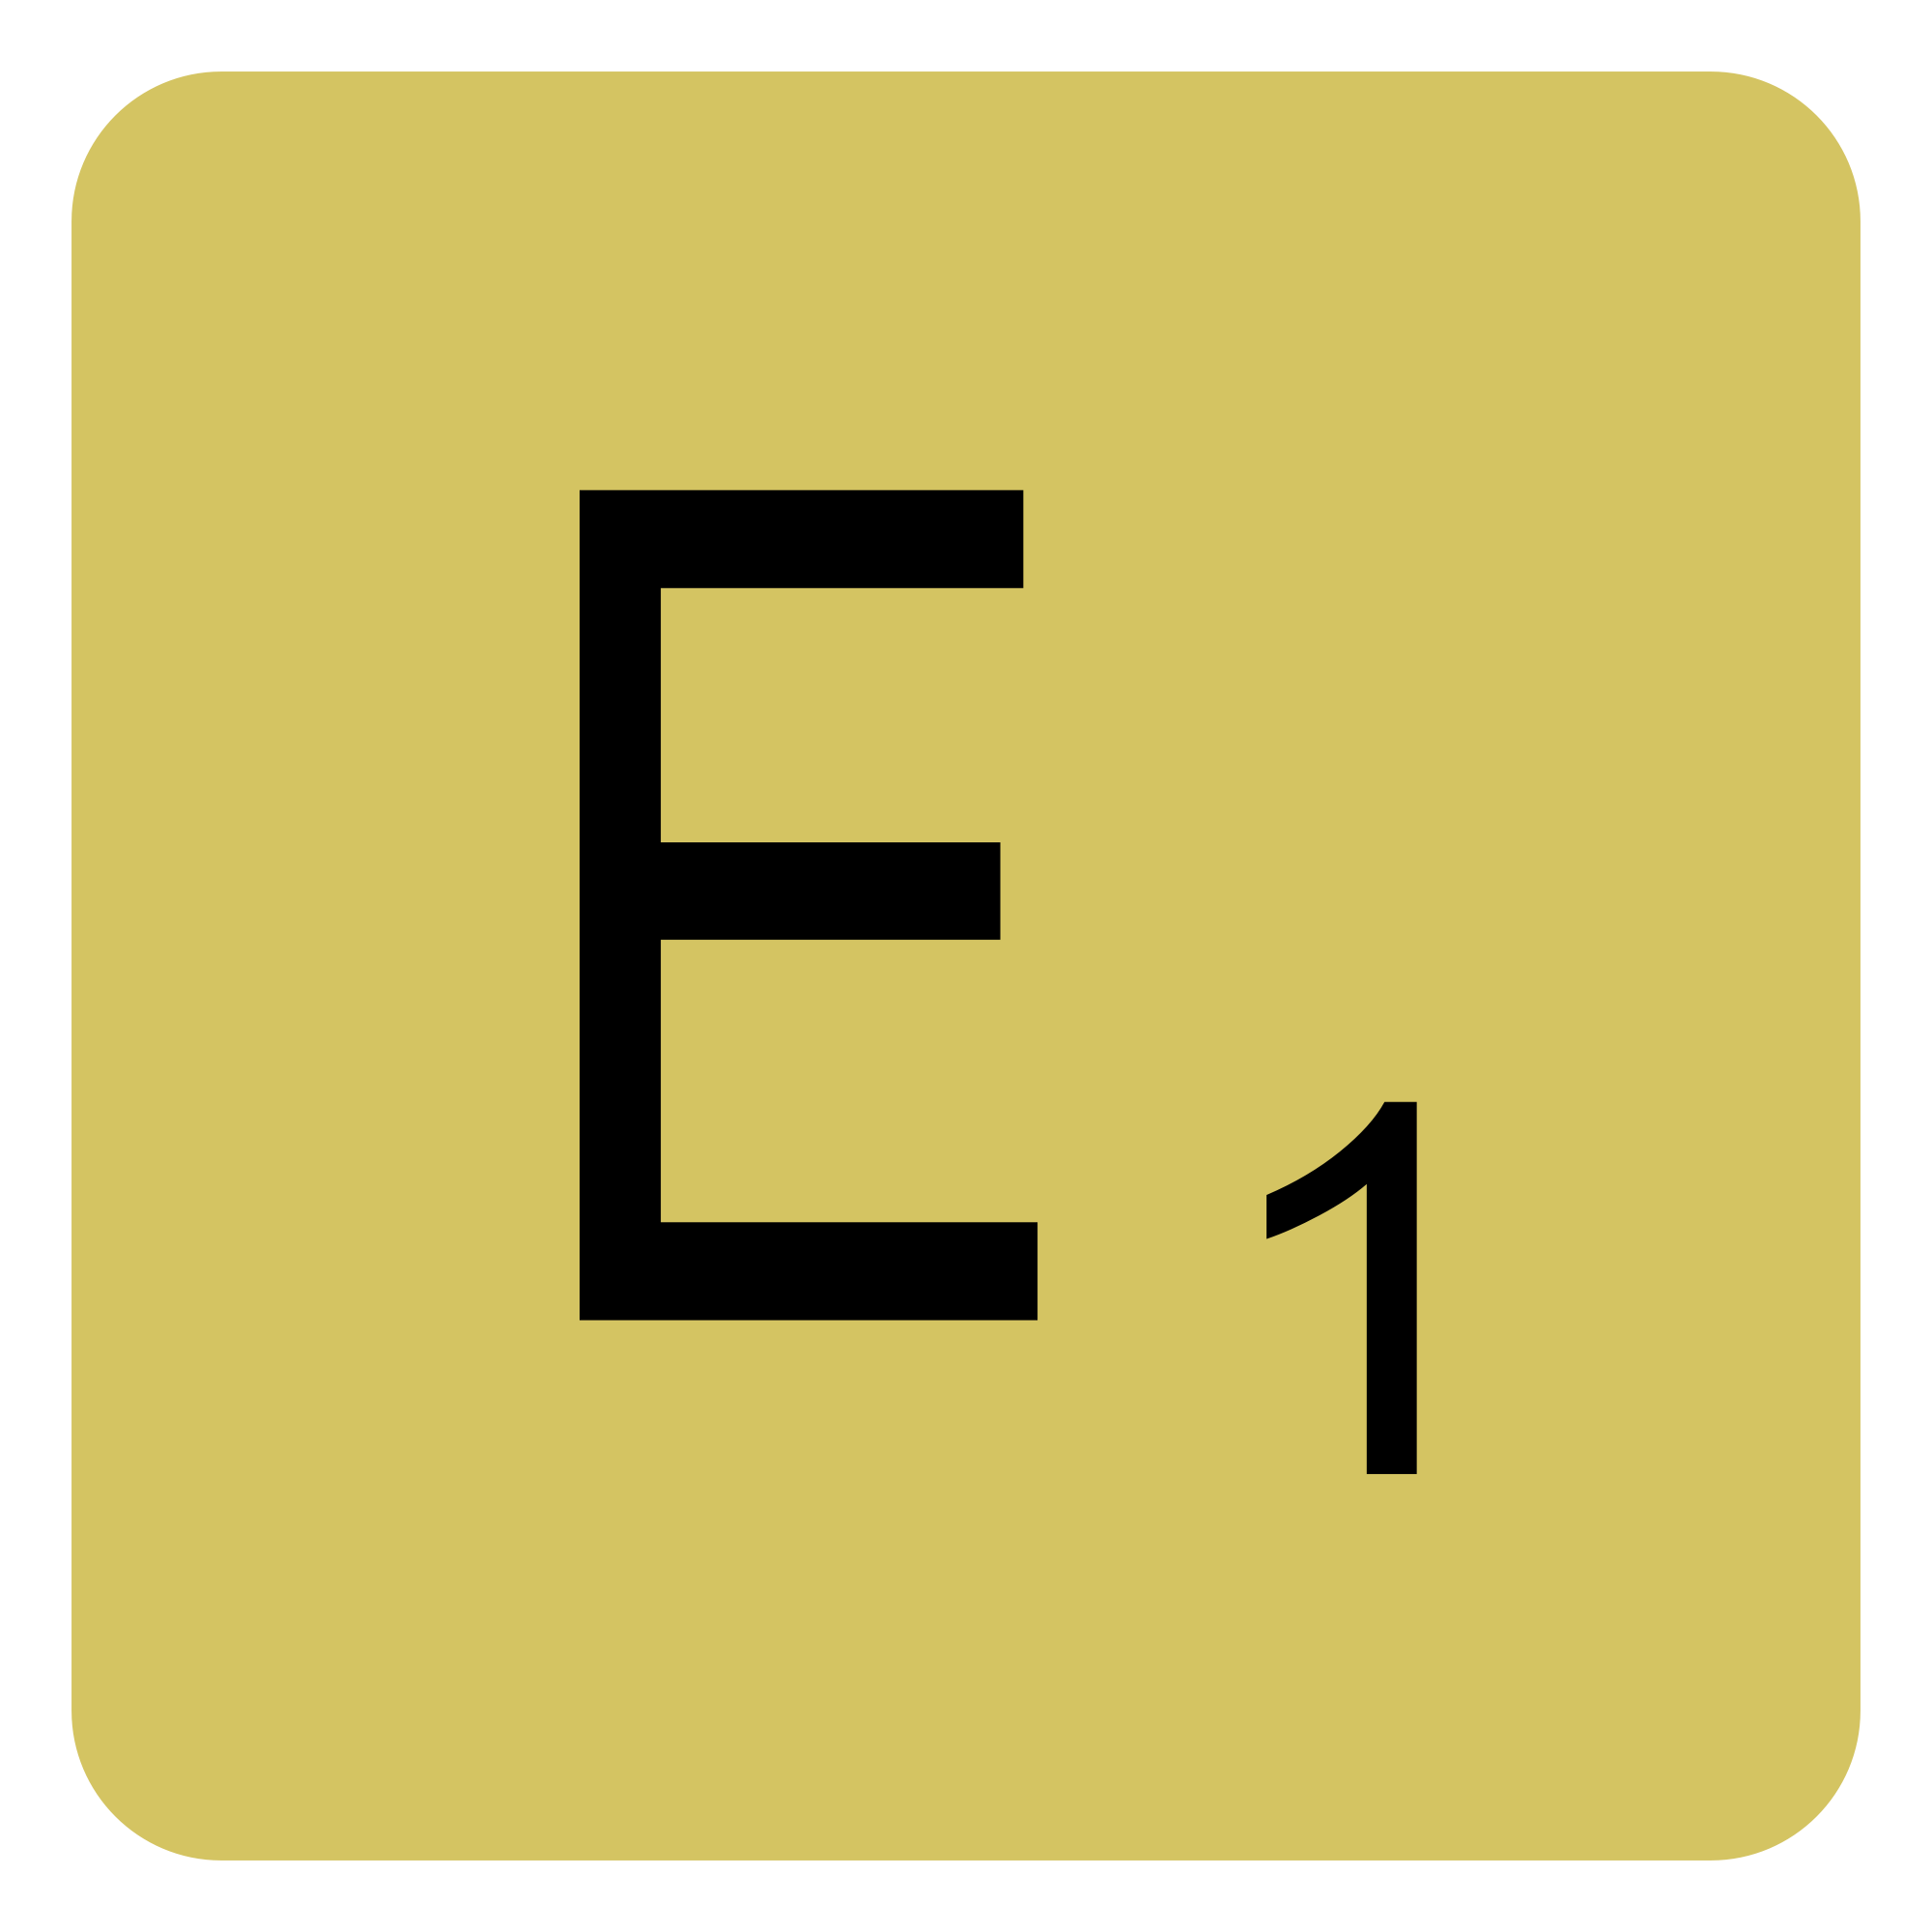 PNG Scrabble - 86086